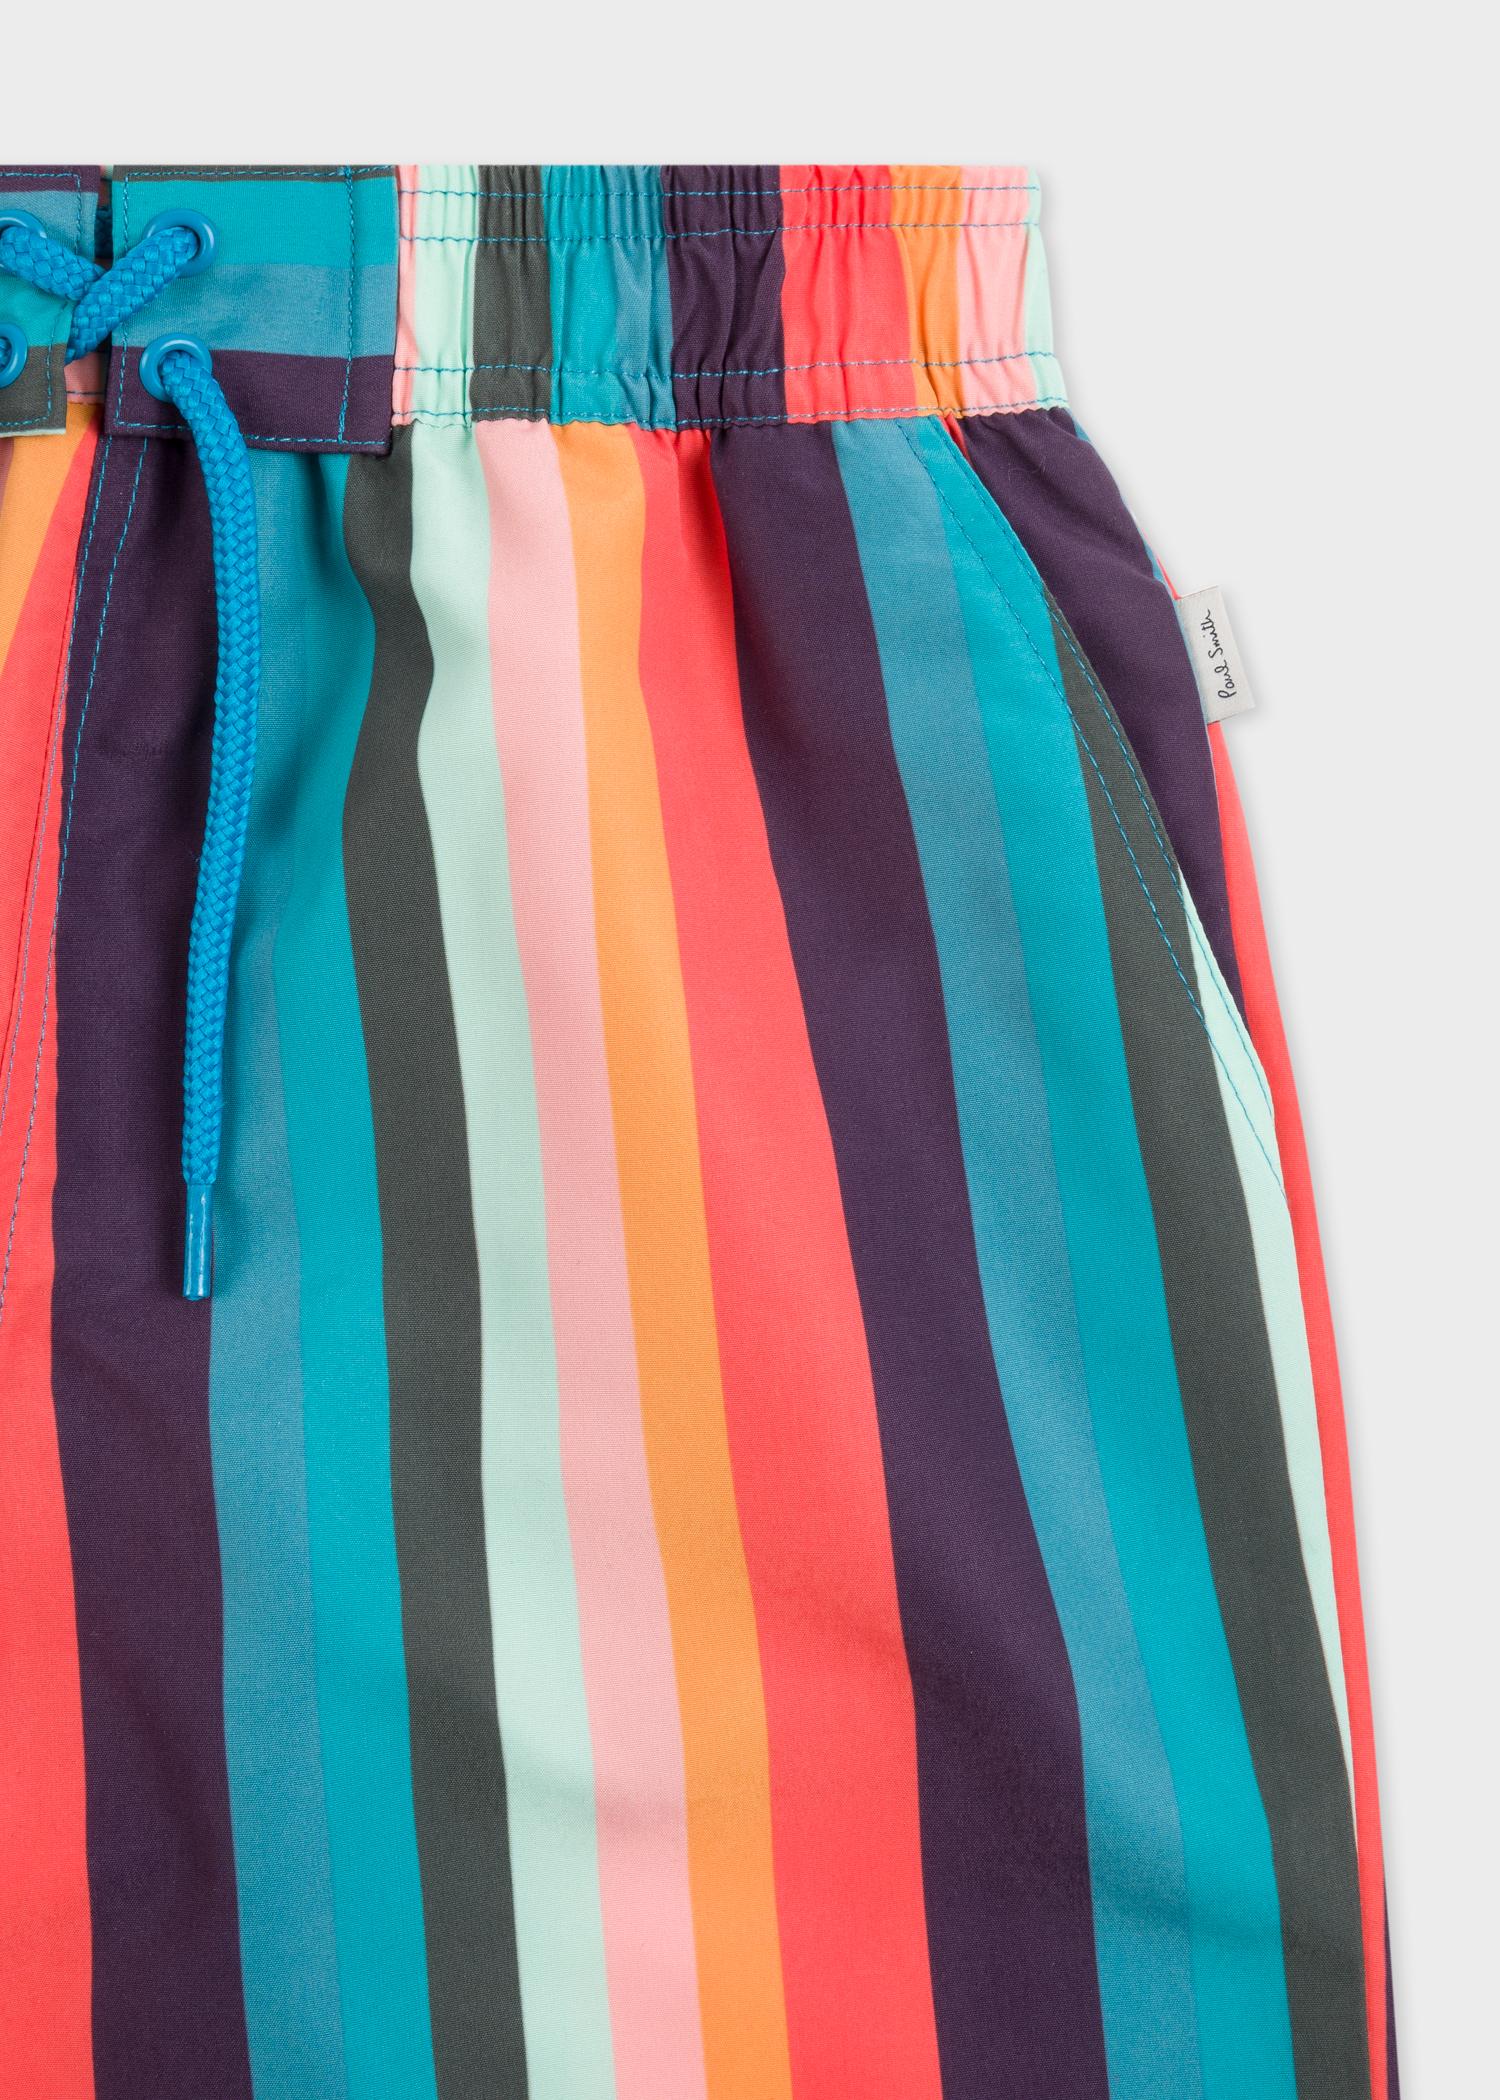 827db1364d Boys' 0-14 Years 'Artist Stripe' Swim Shorts - Paul Smith